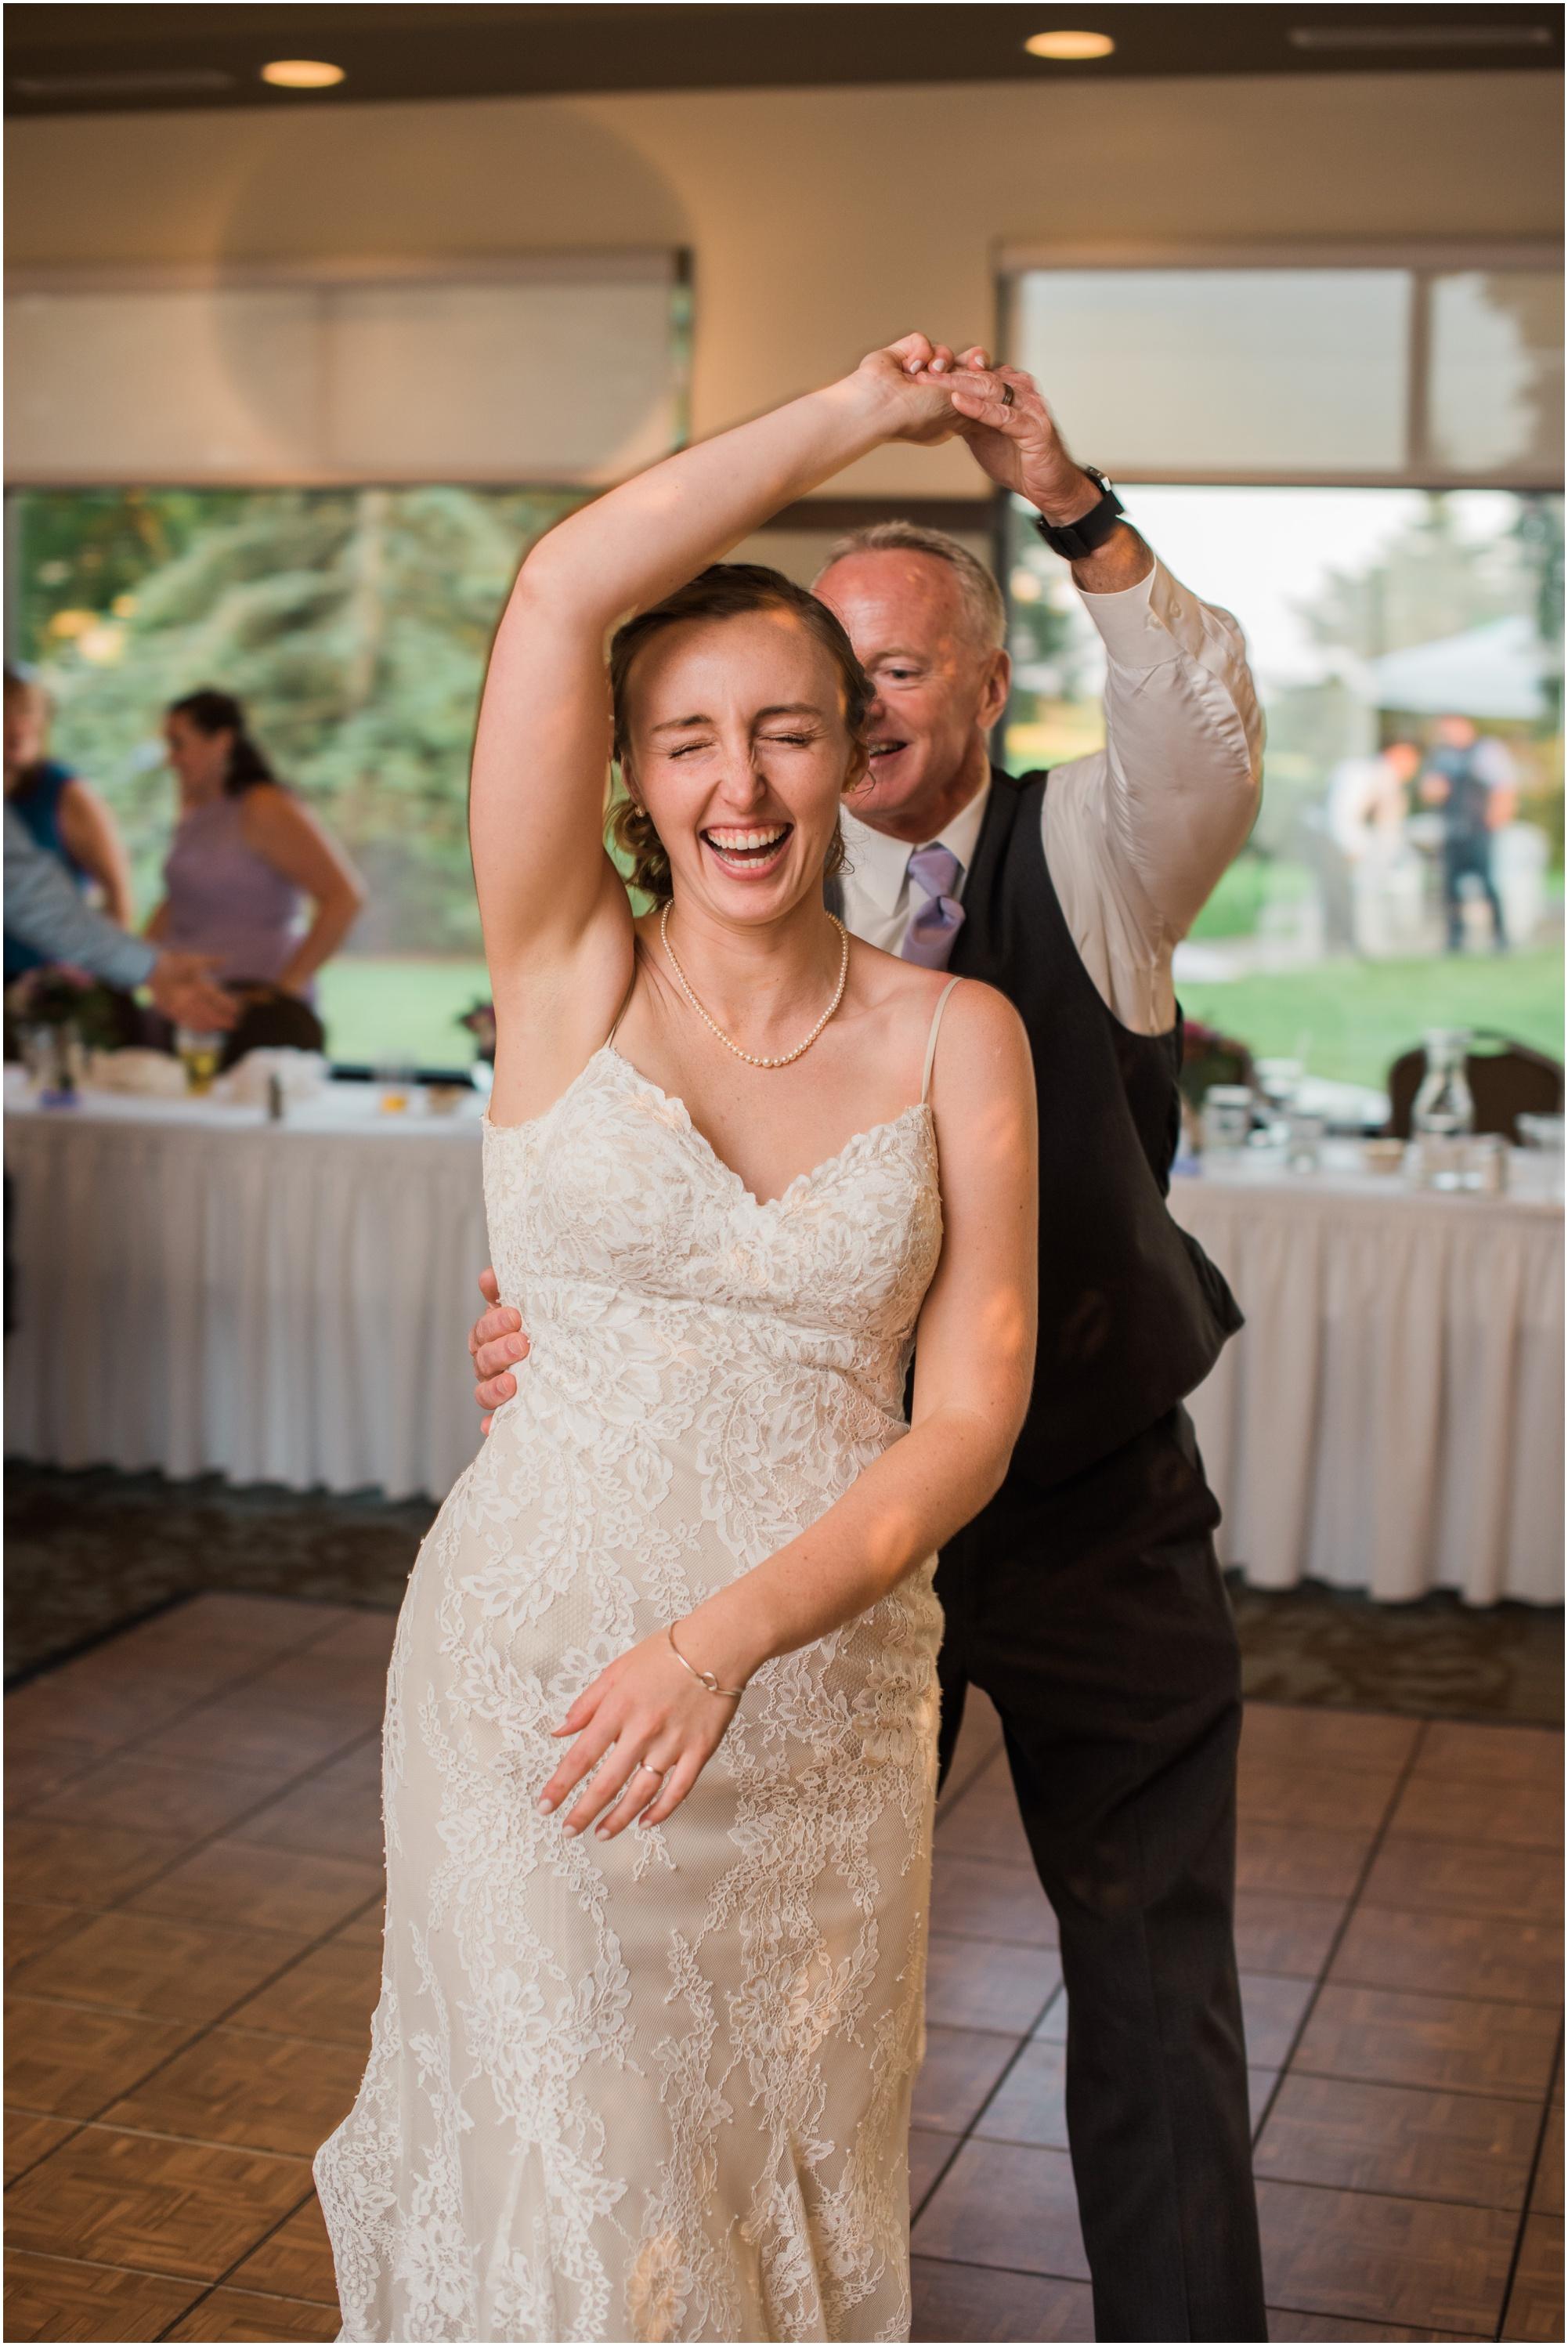 Wisconsin-Wedding-Photographer-Reedsburg-Country-Club-Kaela-and Matt-Wedding-885.jpg